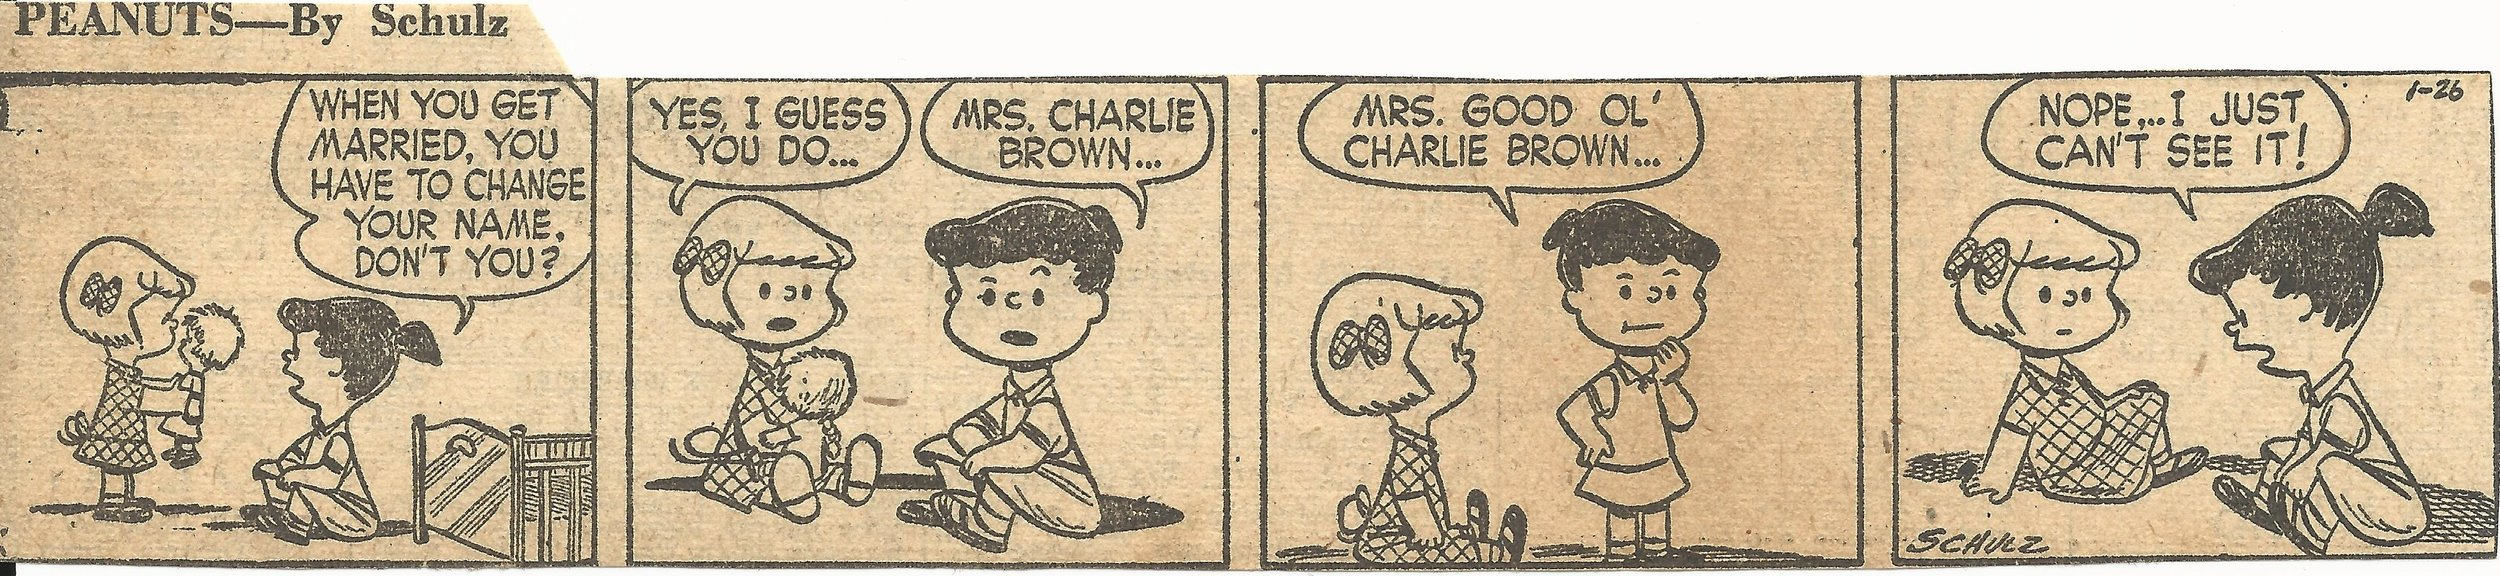 15. Jan. 28, 1953 (Oma)_Page_6 (5).jpg